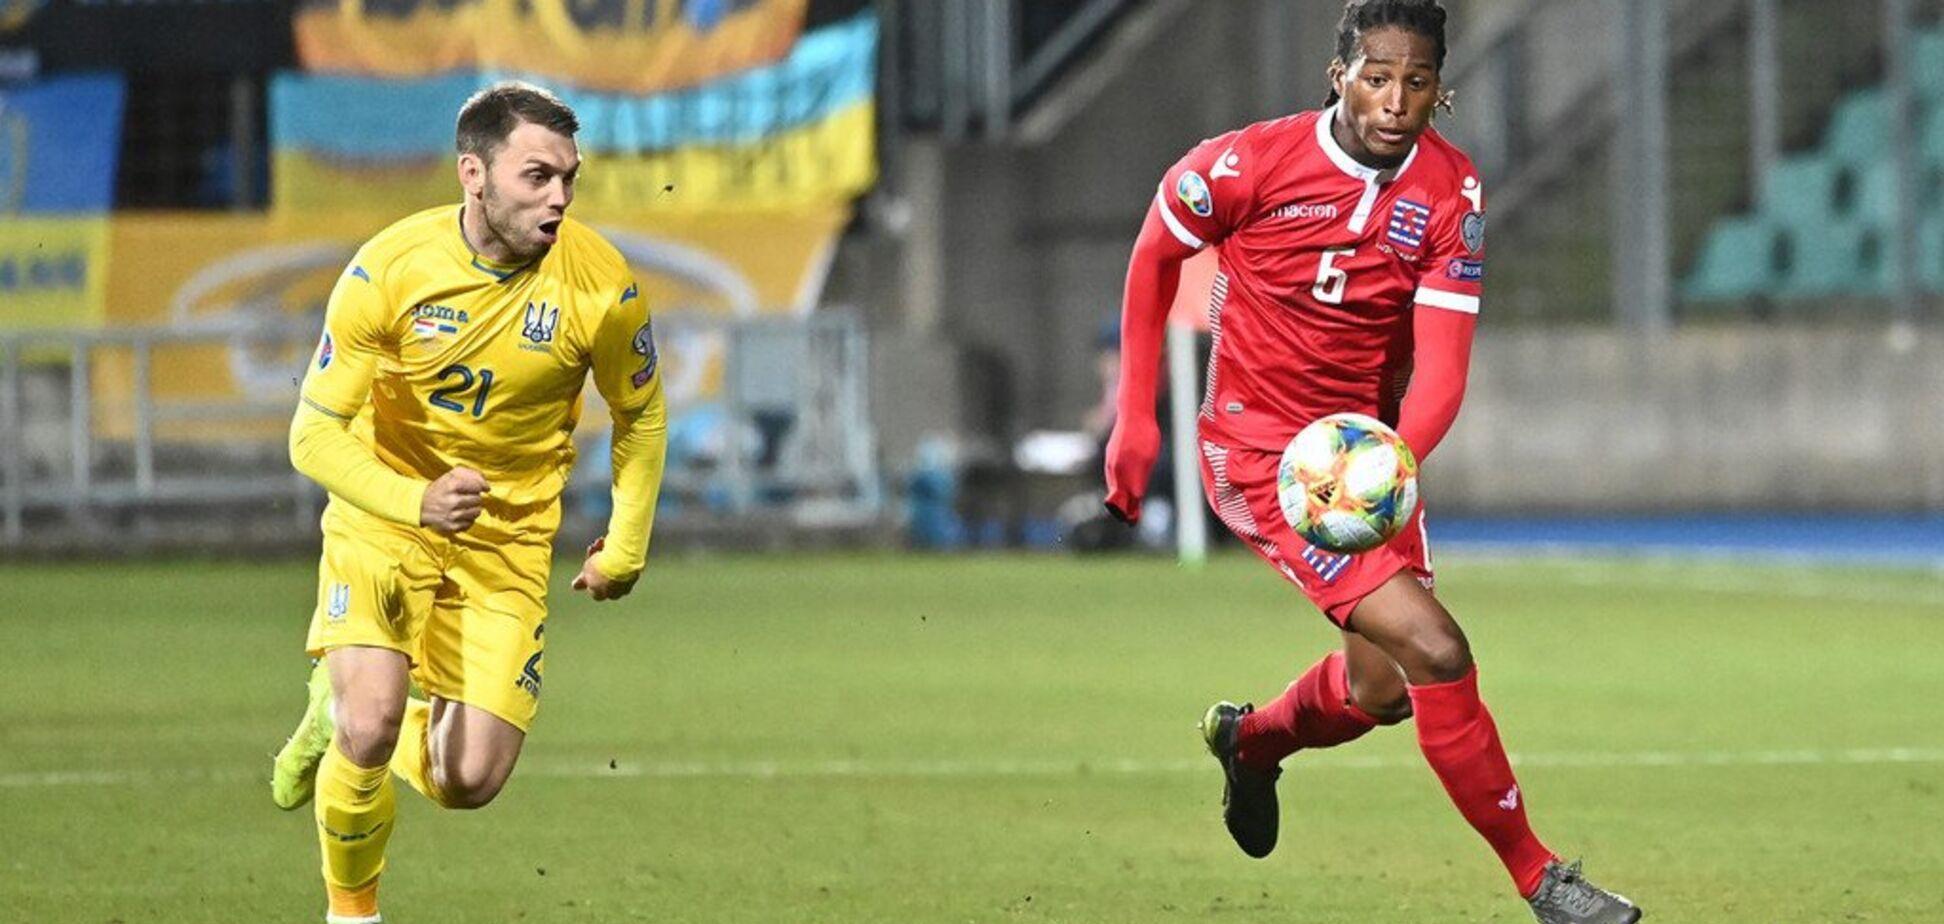 Александр Караваев (слева). Источник: Федерация футбола Люксембурга